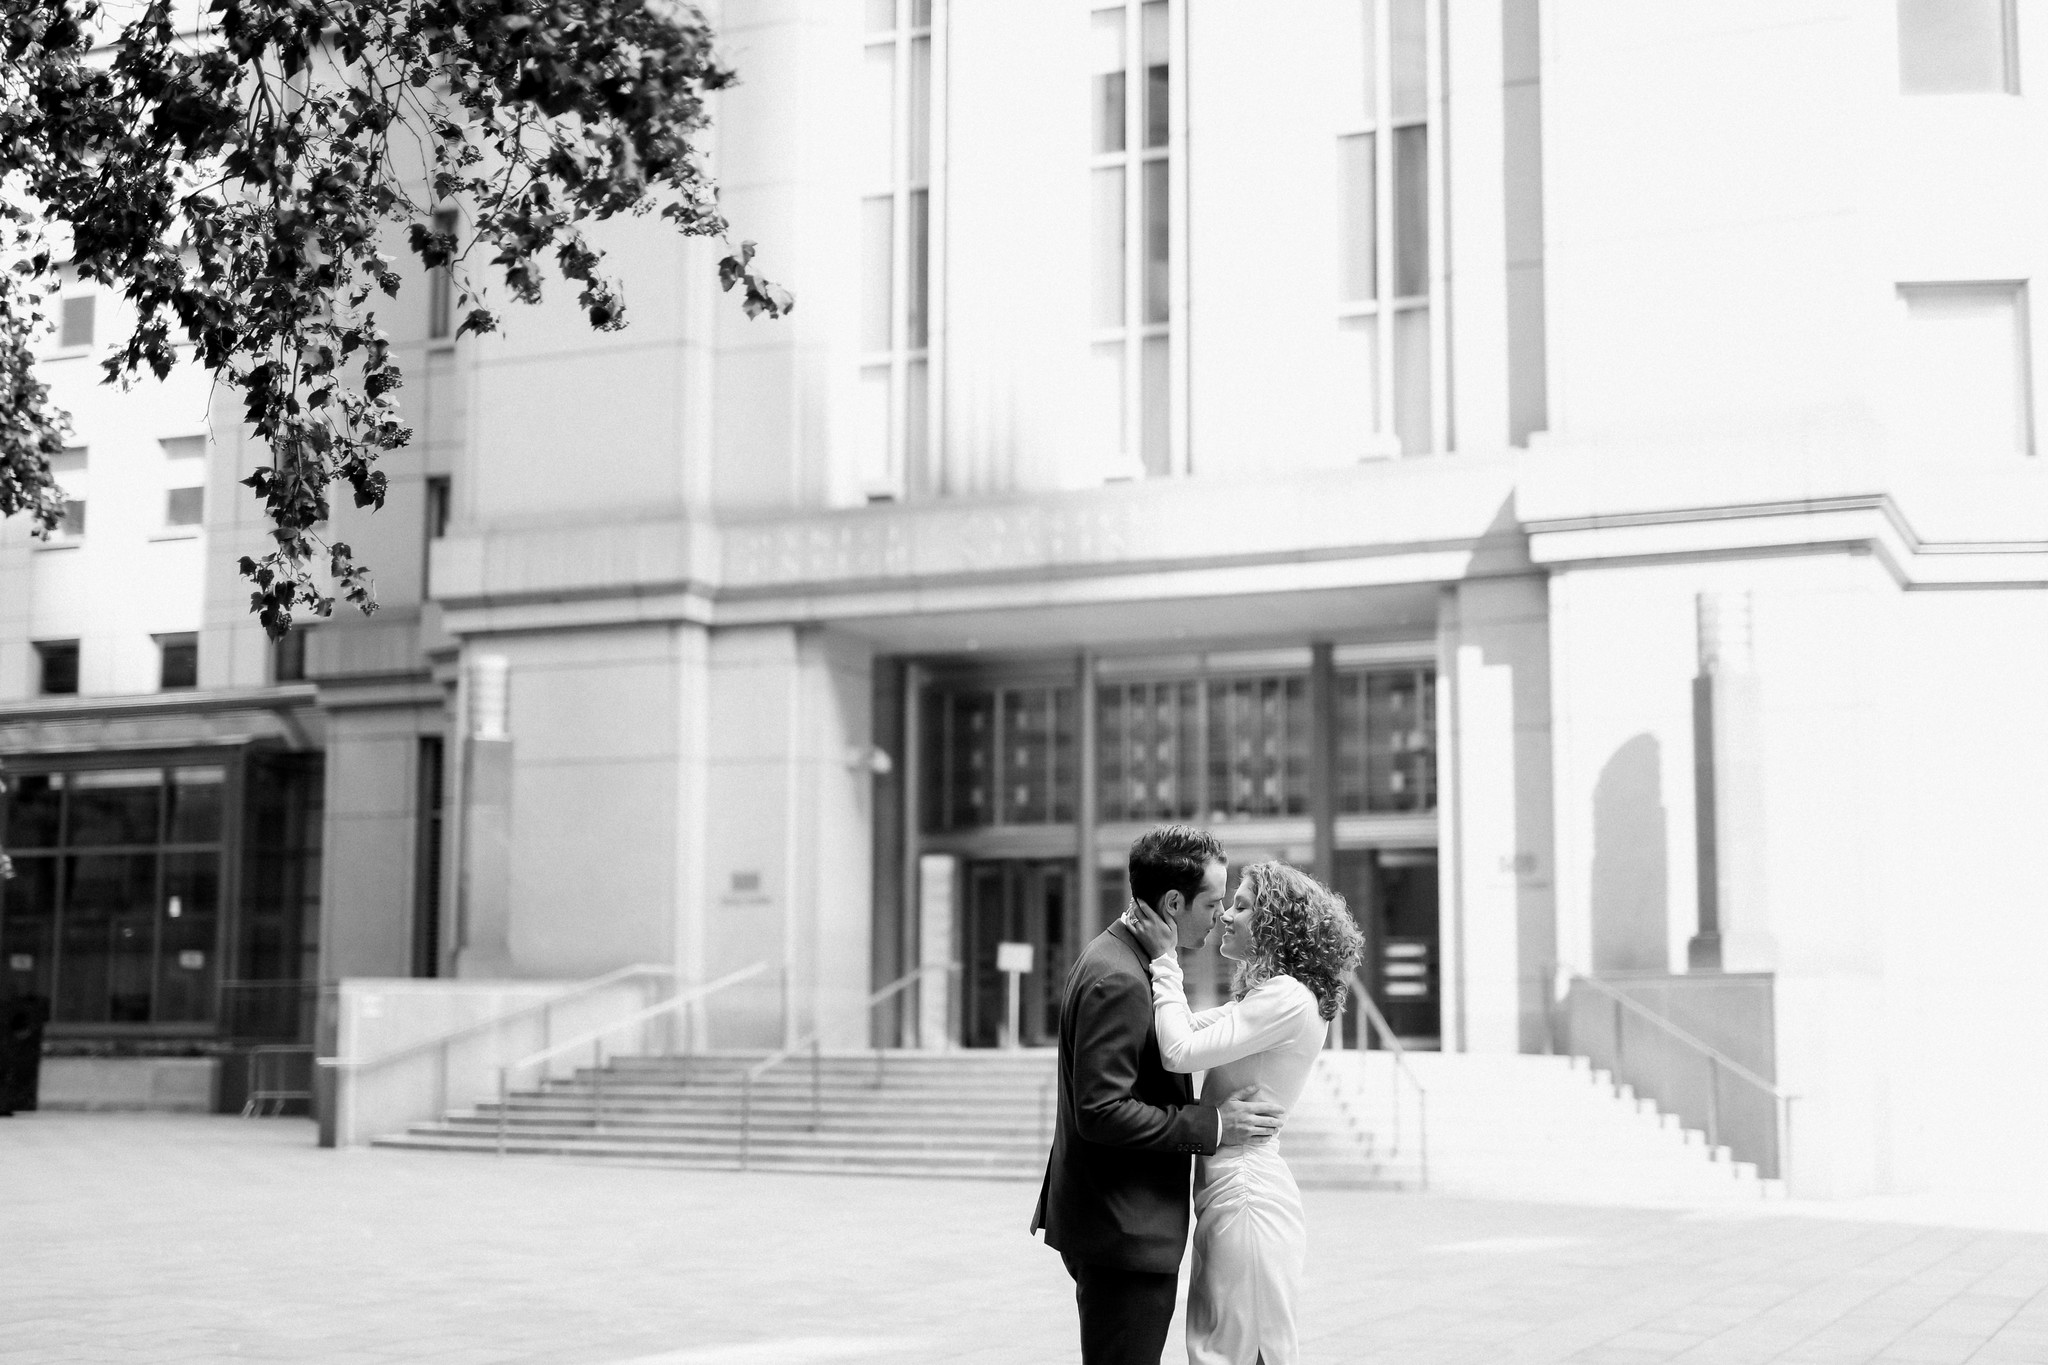 NY city hall wedding__ct wedding_ct wedding photographer-4.jpg